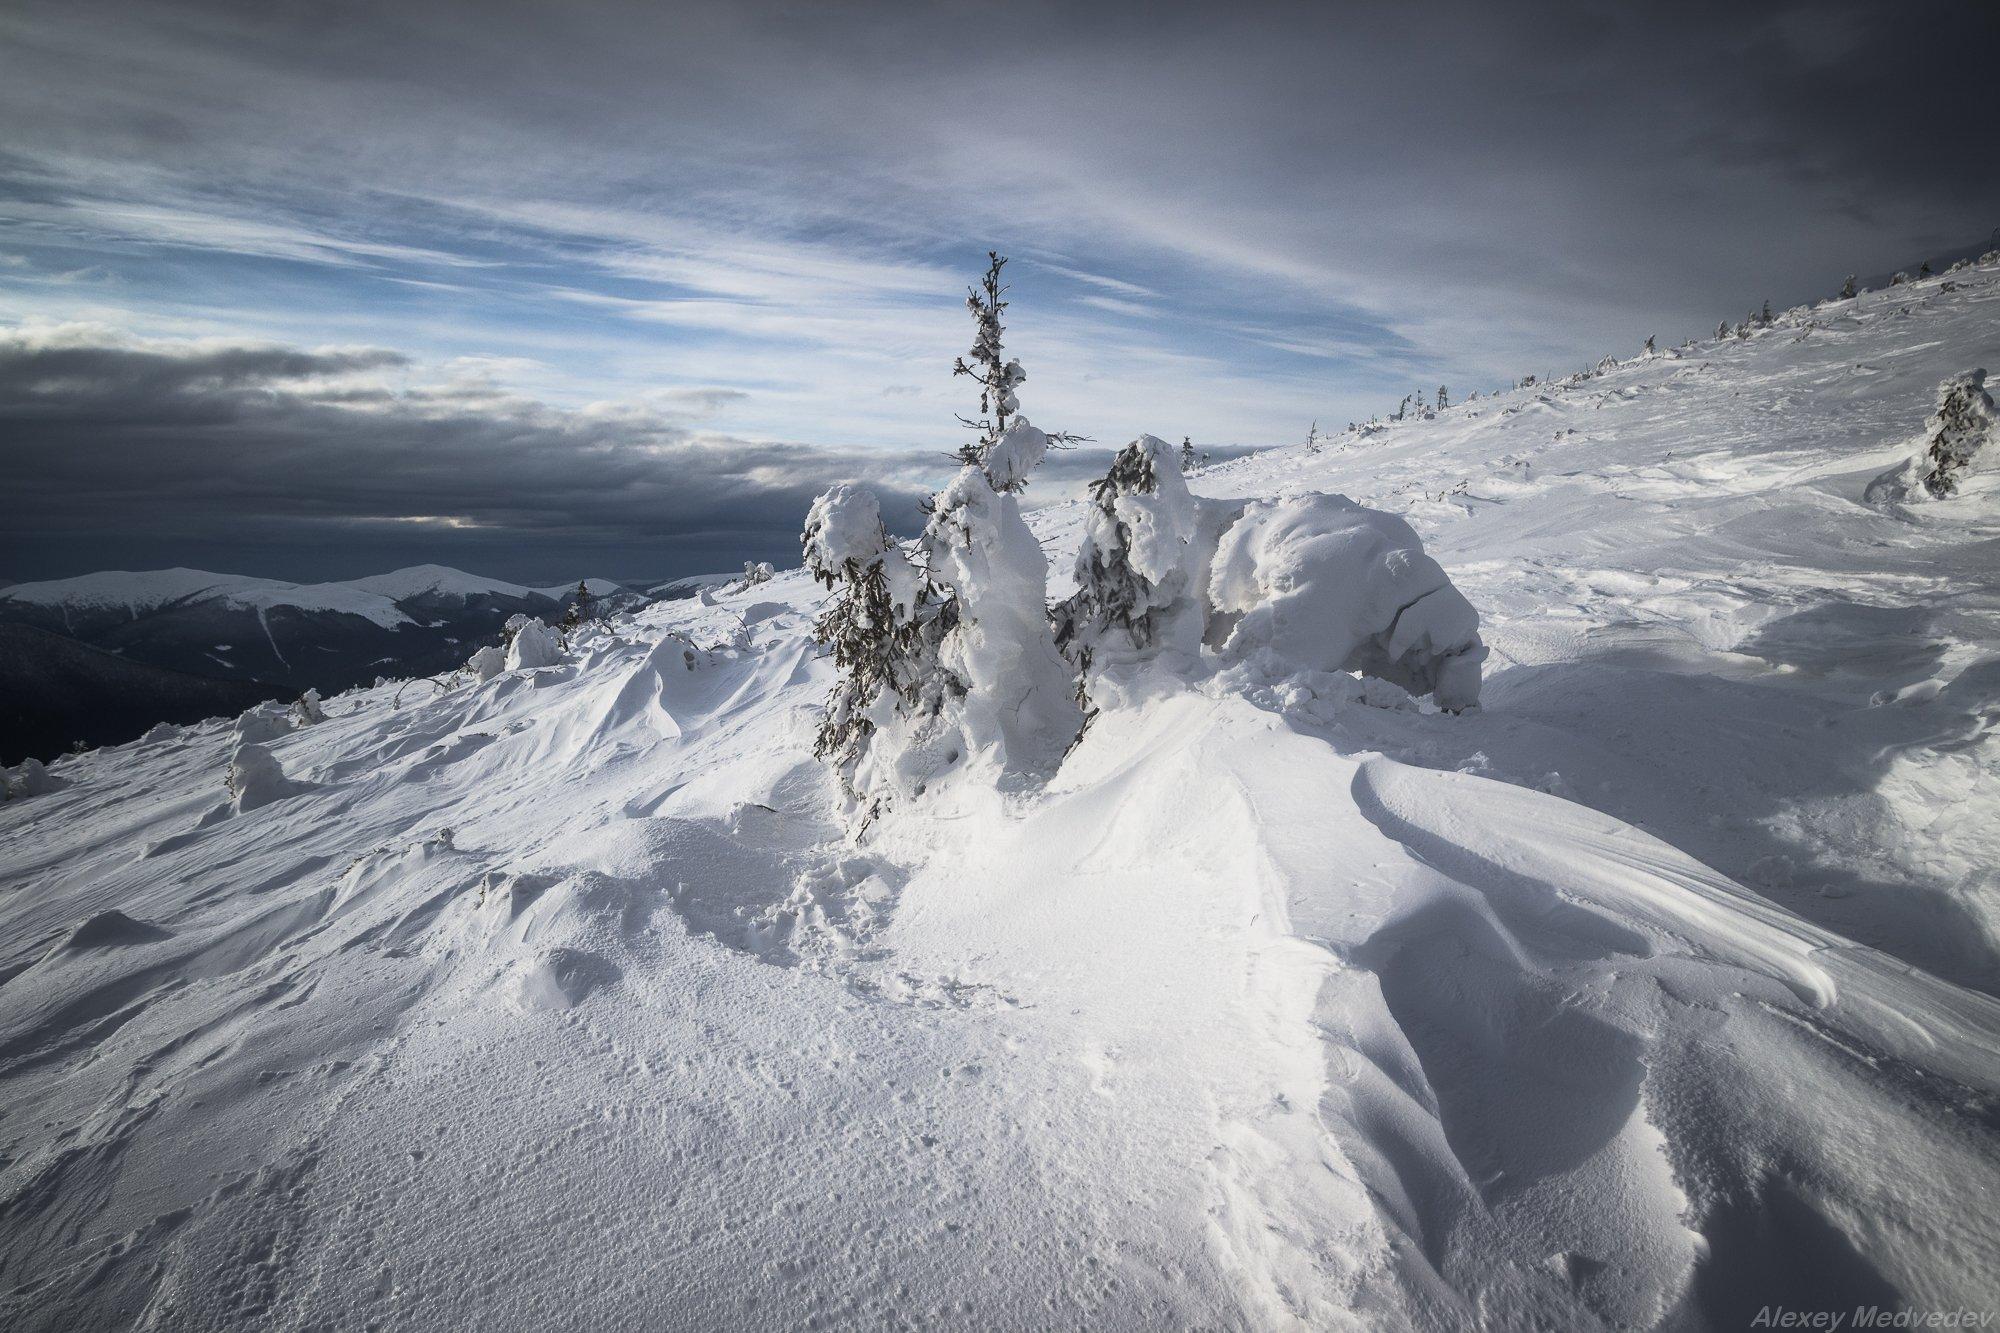 Карпаты, Украина, зима, горганы, Алексей Медведев